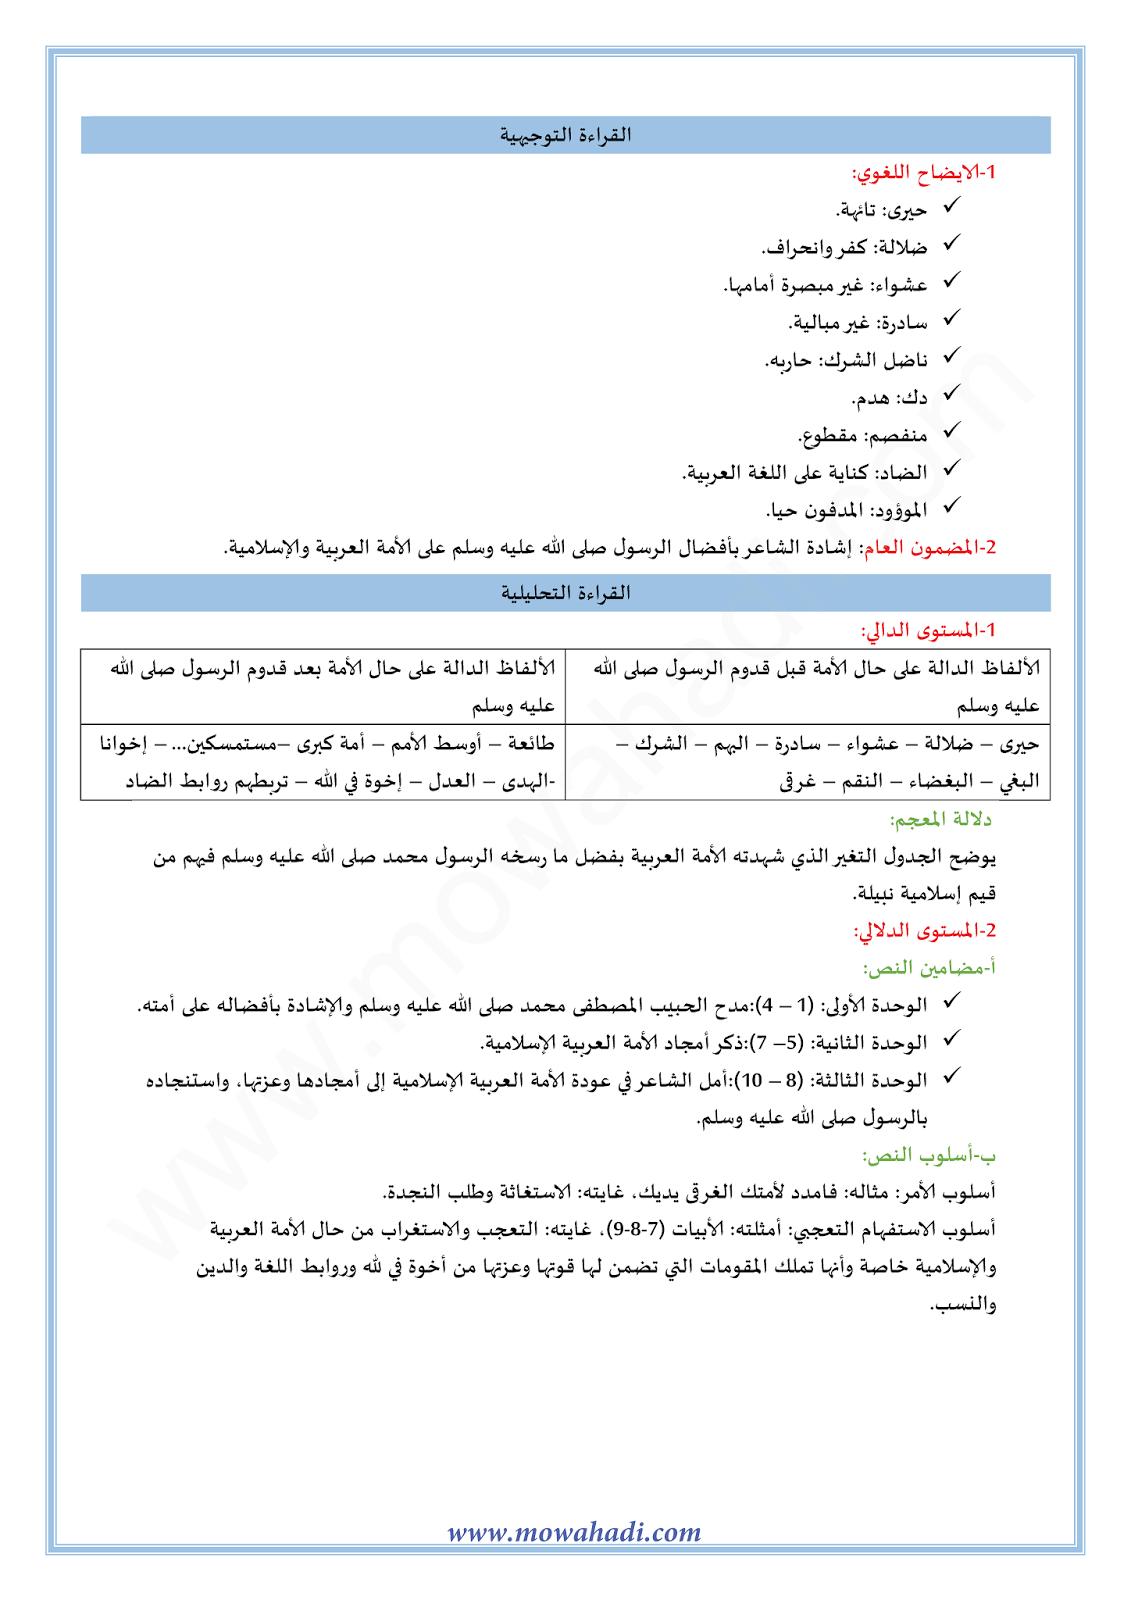 بــــــــــــــــردة1